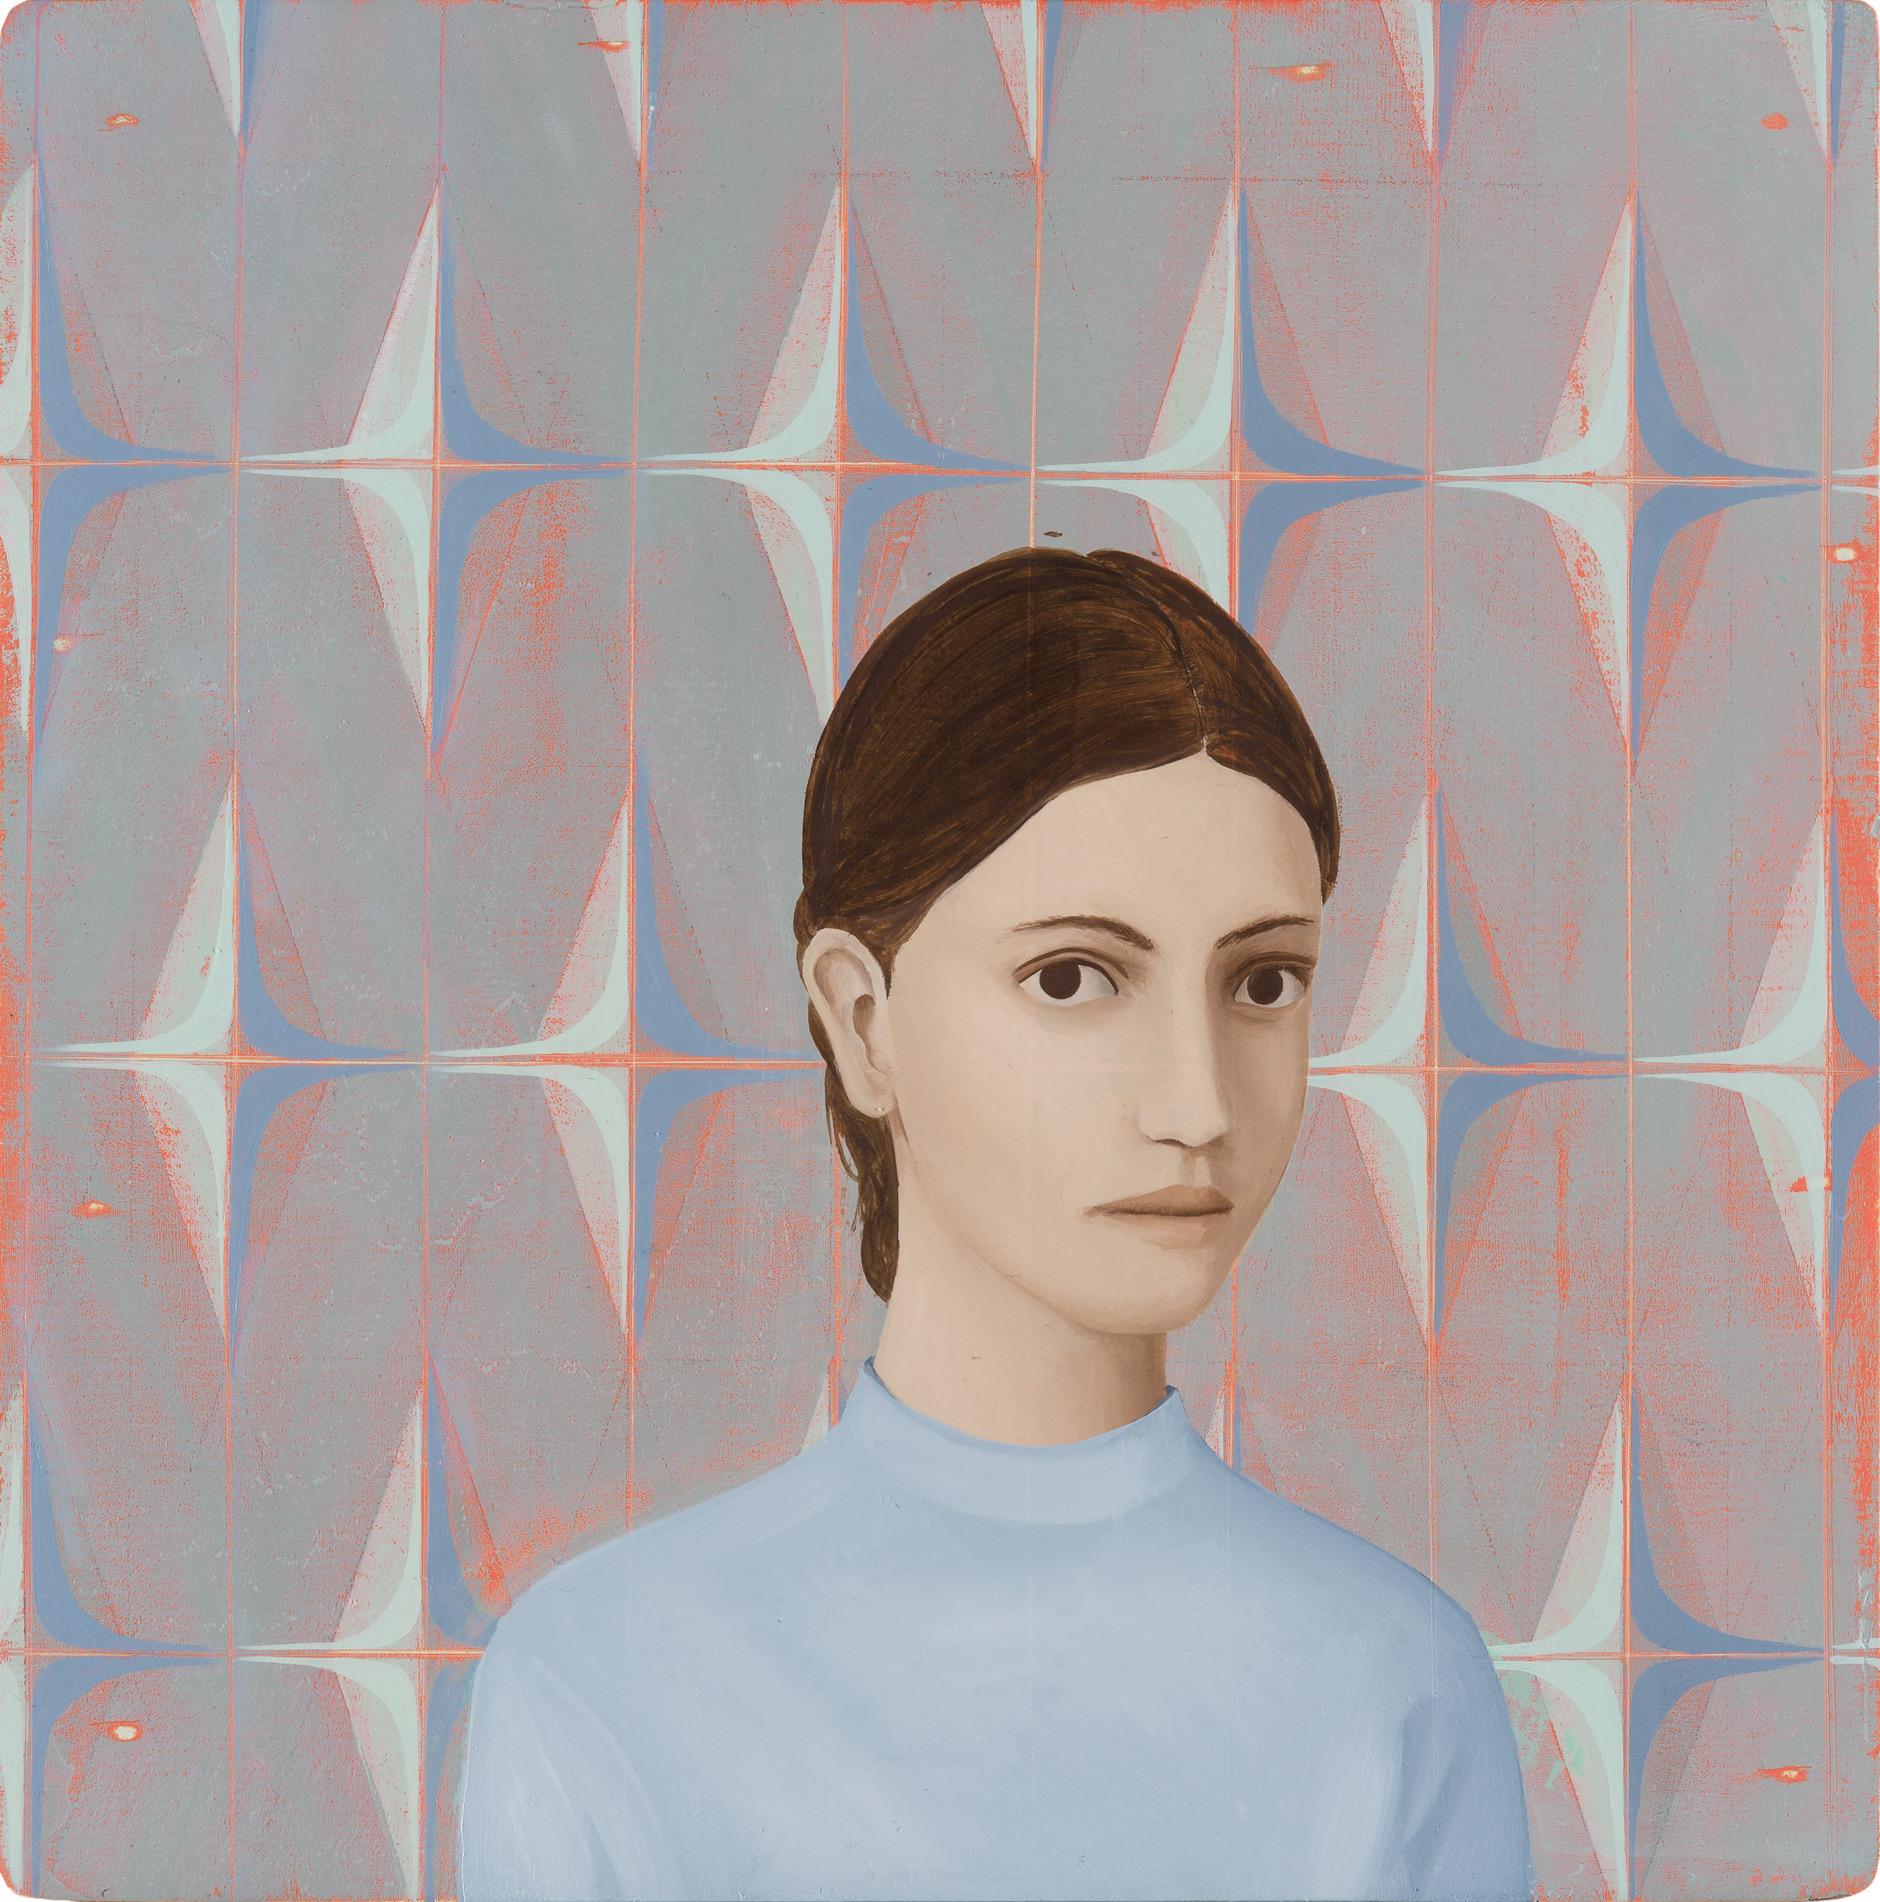 Untitled/20 x 20 cm, Oil on wood/2017